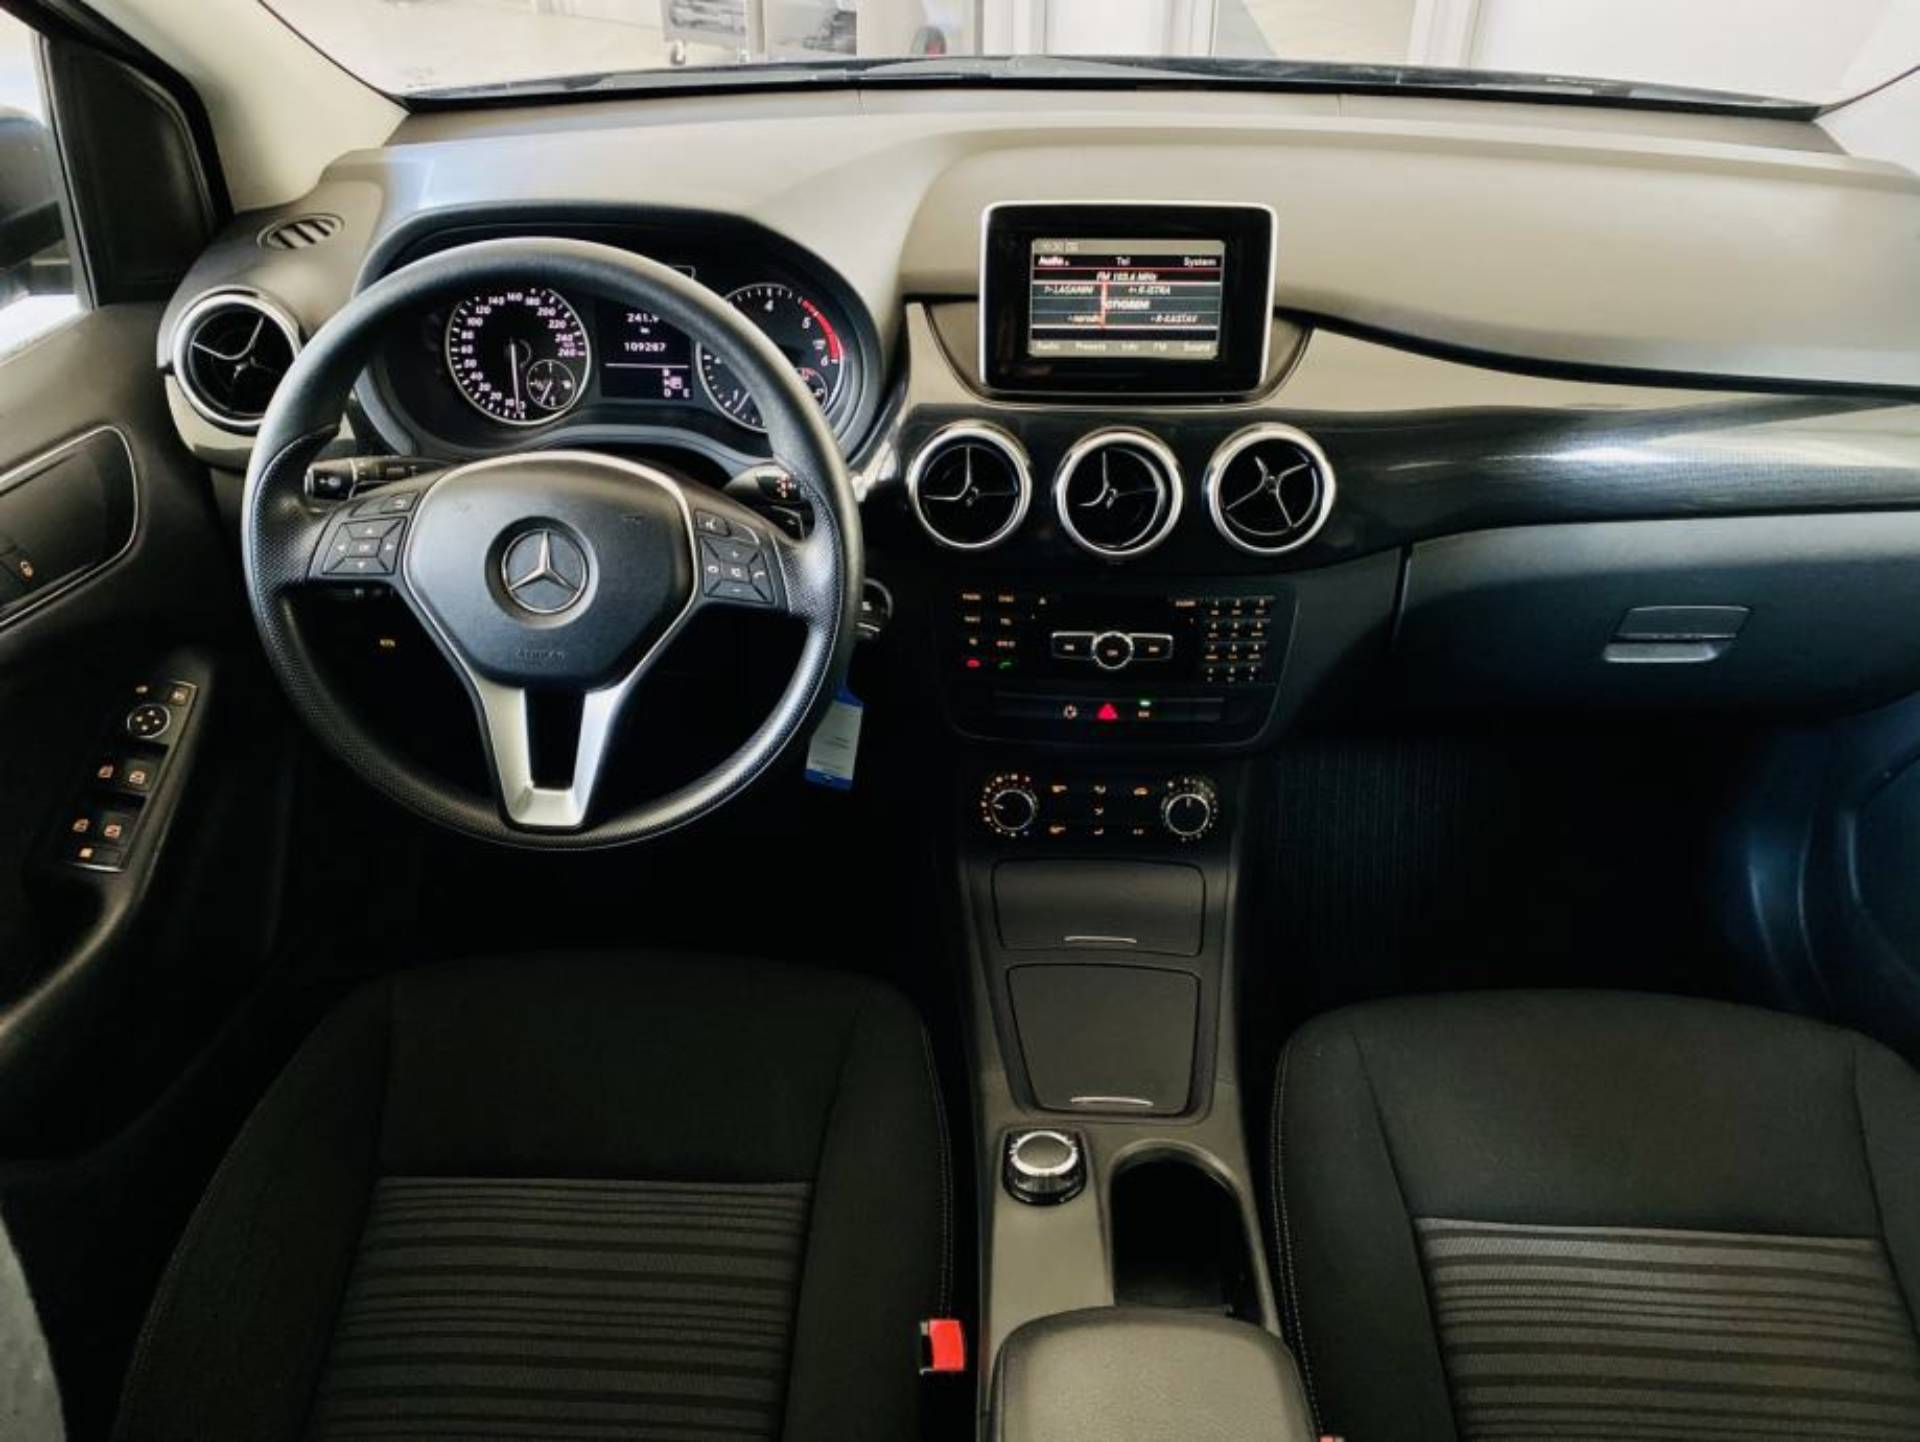 Mercedes-Benz B 180 cdi 7G